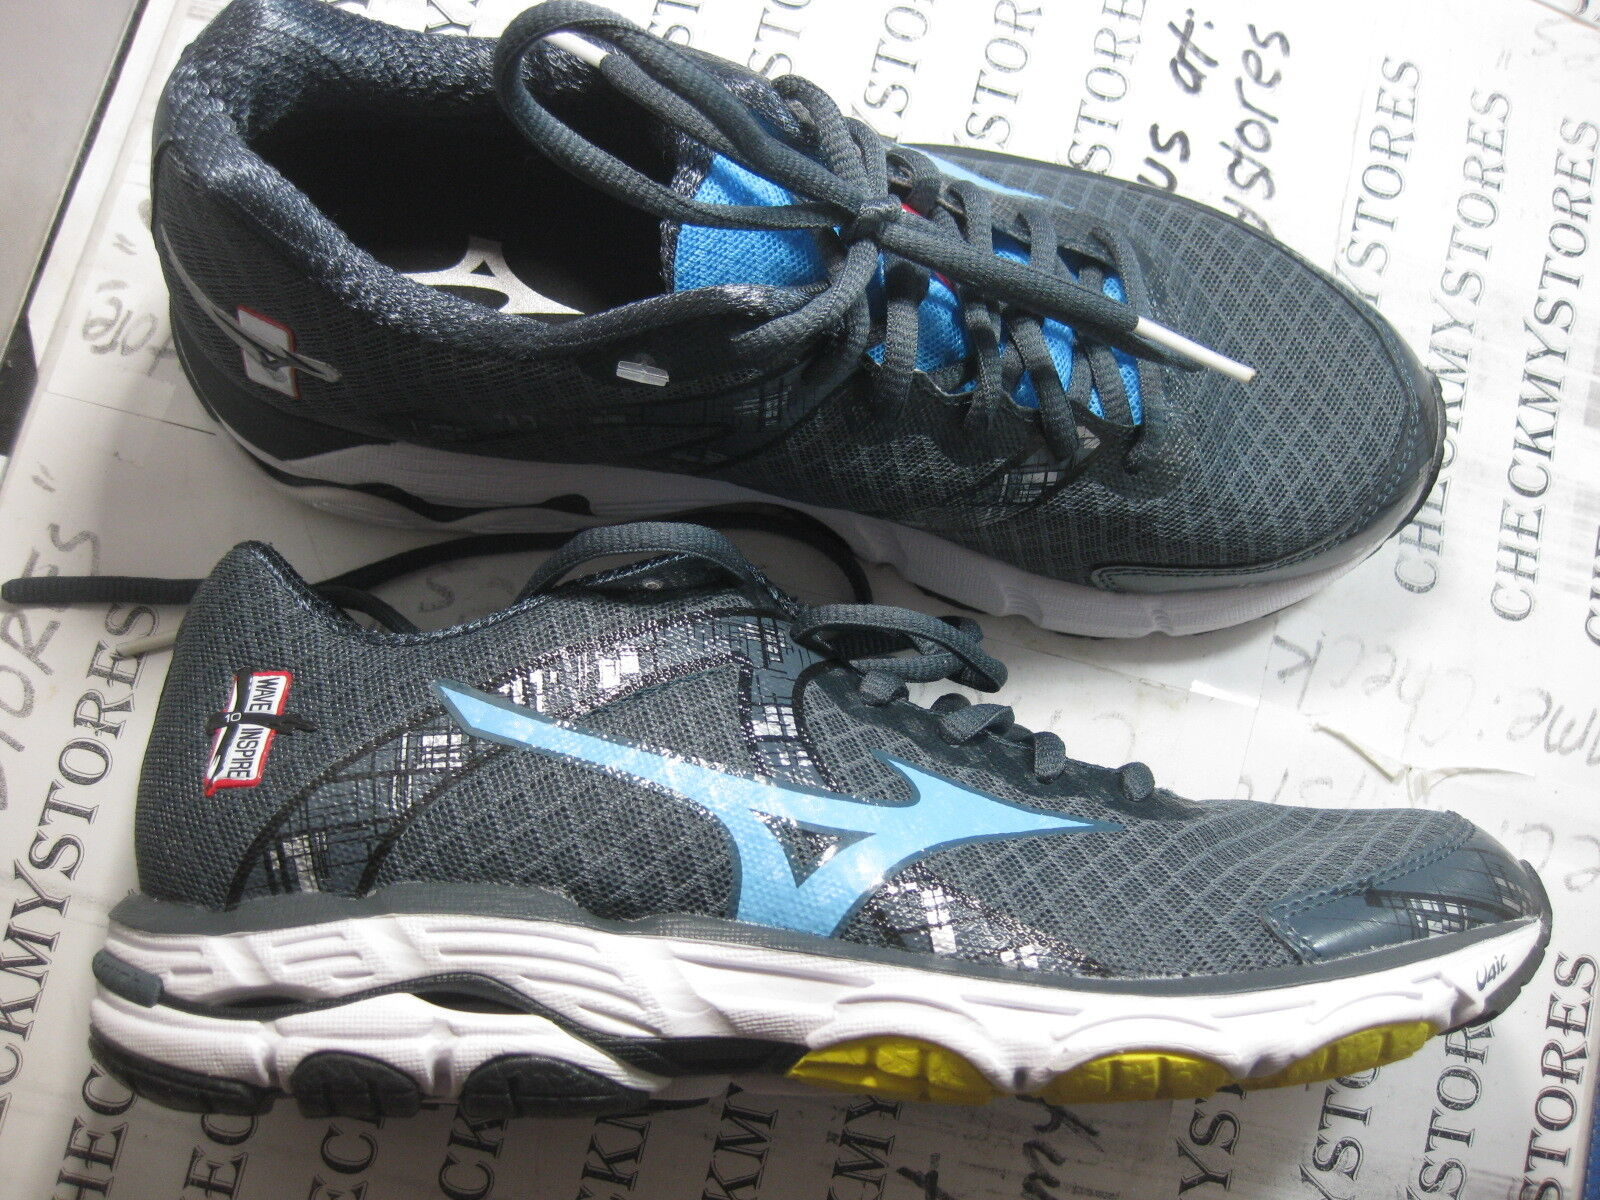 NIB NEW  Mizuno Wave Inspire 10 Damenschuhe Running Schuhes MANY SIZES AVALIABLE